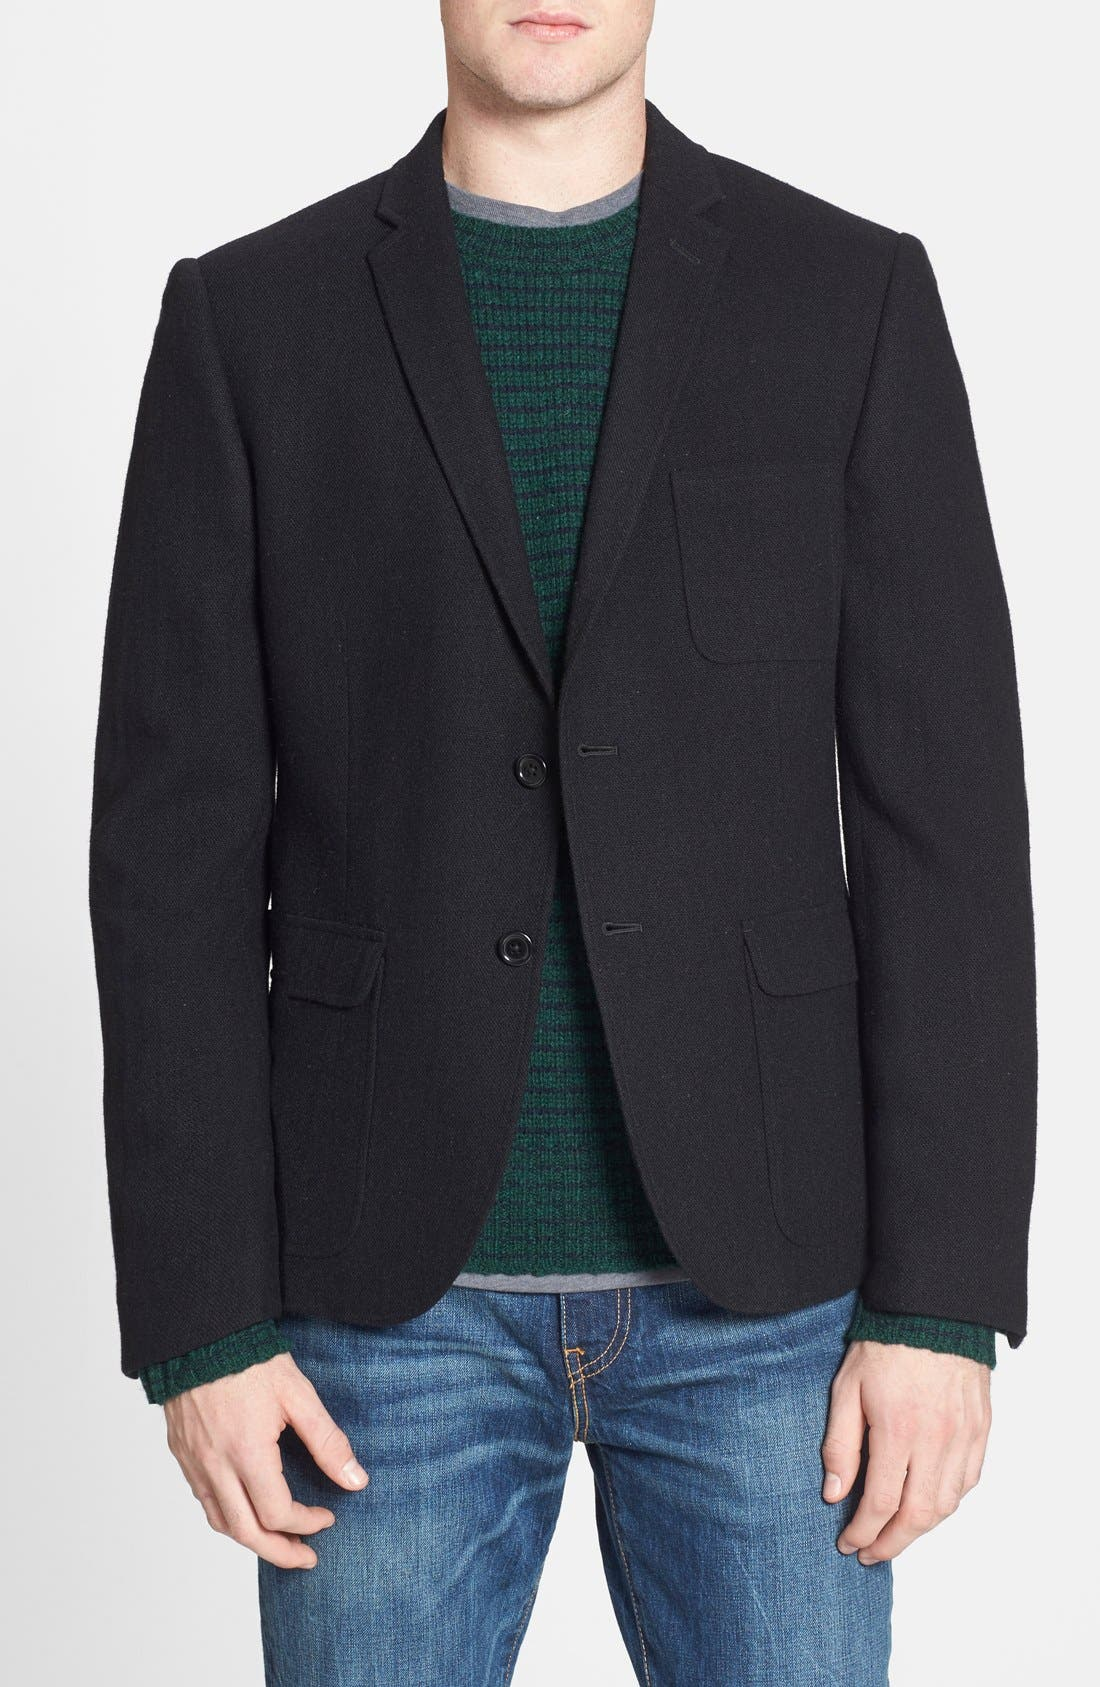 DOCKERS<SUP>®</SUP>, Dockers Trim Fit Wool Blend Blazer, Main thumbnail 1, color, 001